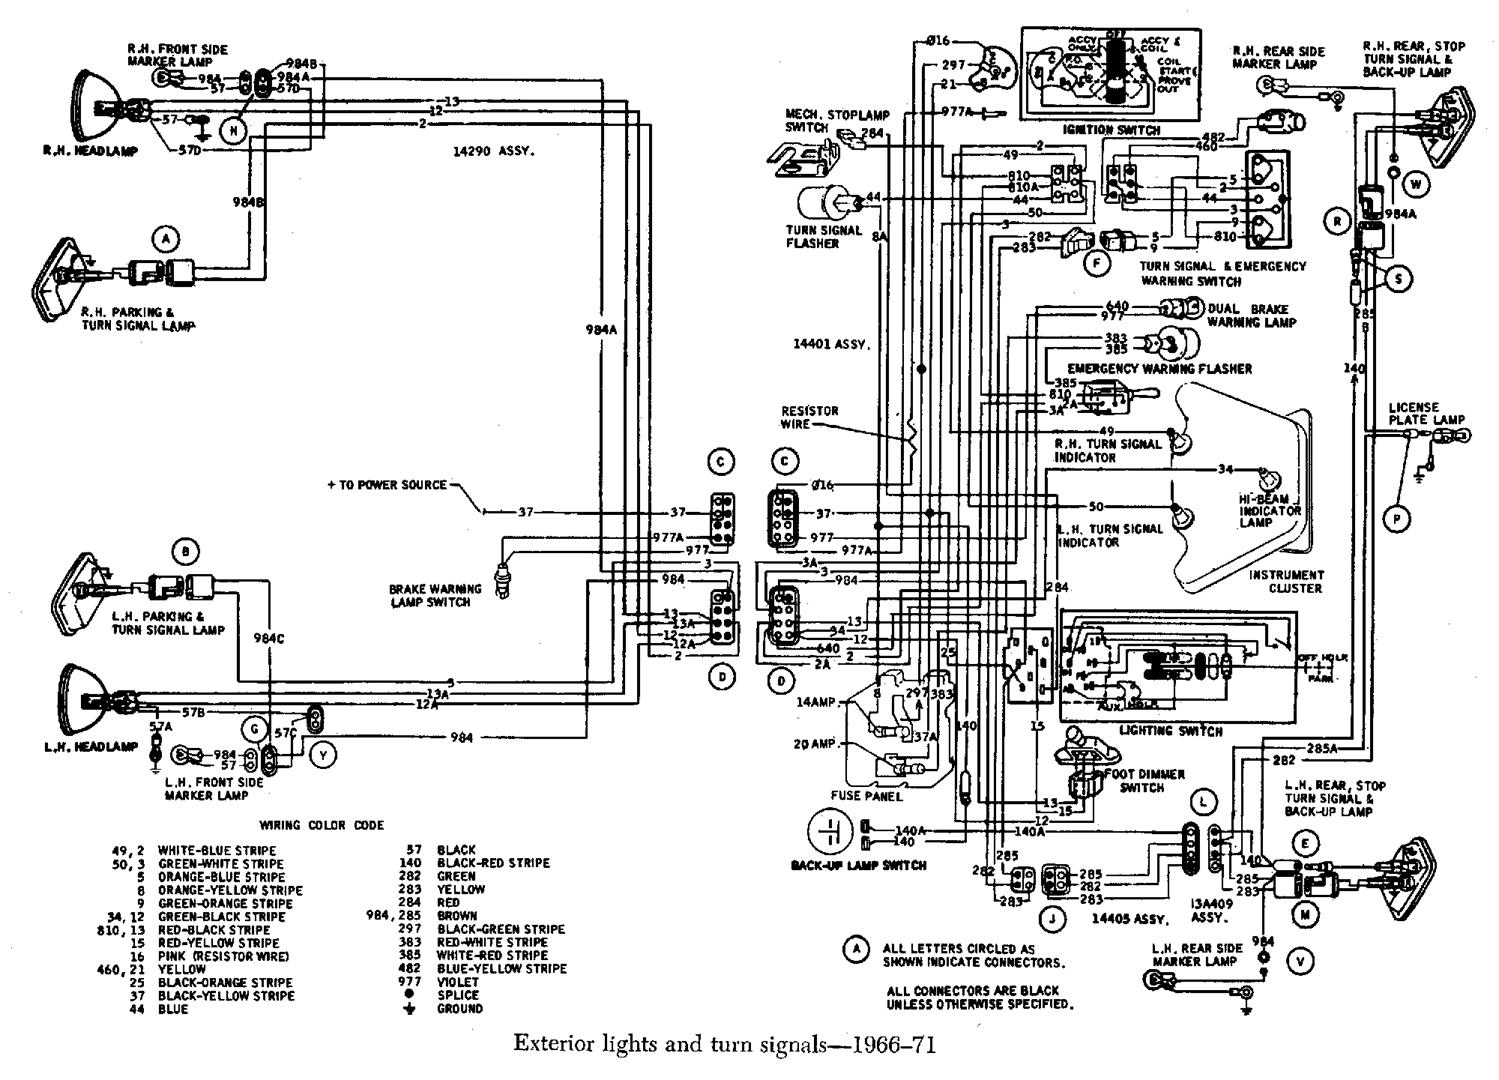 1969 Bronco Wiring Diagram Fuse Box Diagram 2002 Ford Explorer Front Begeboy Wiring Diagram Source